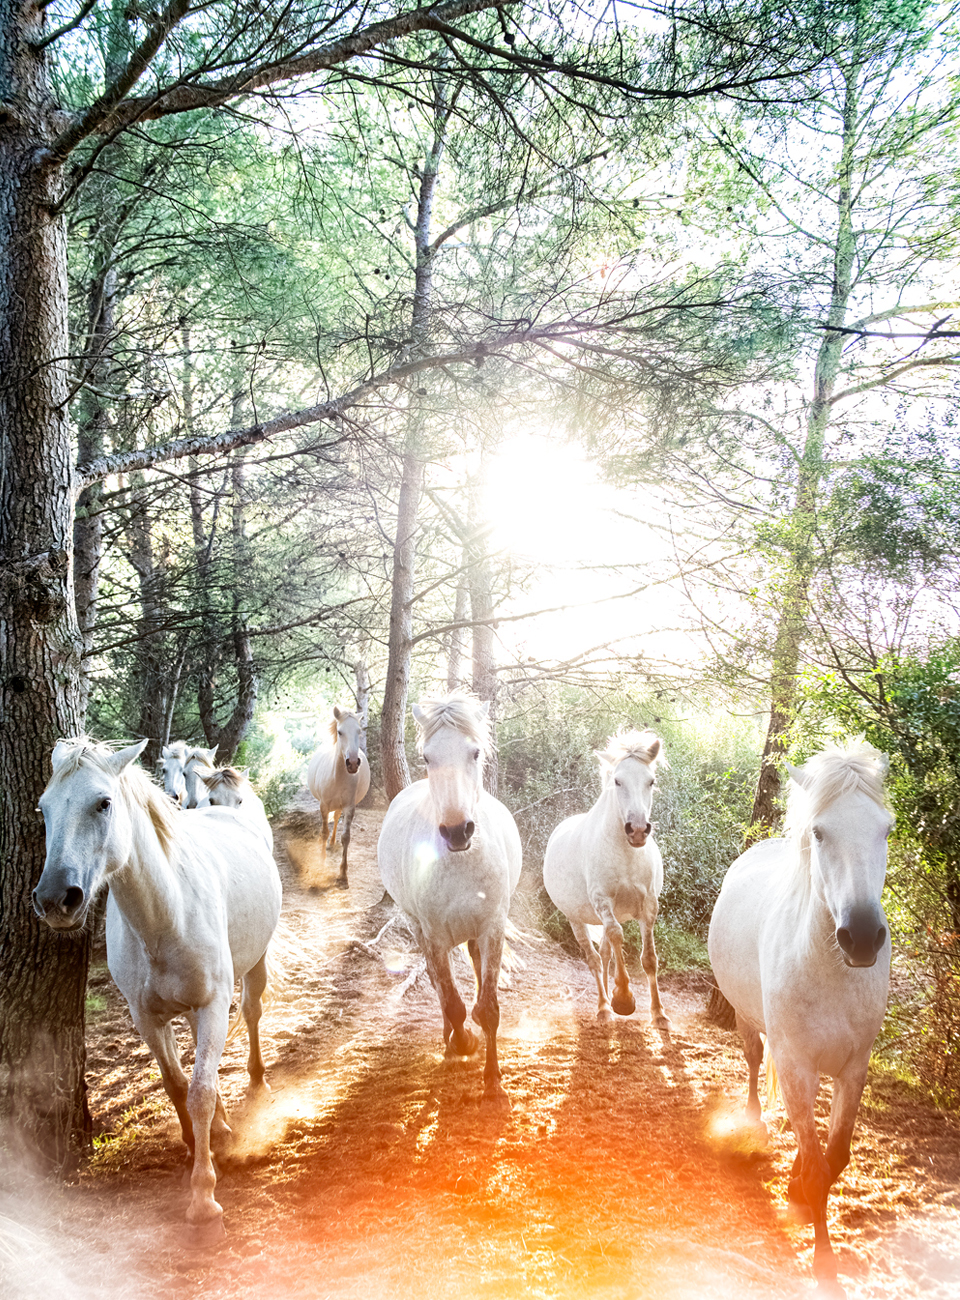 mist-of-camargue-horses